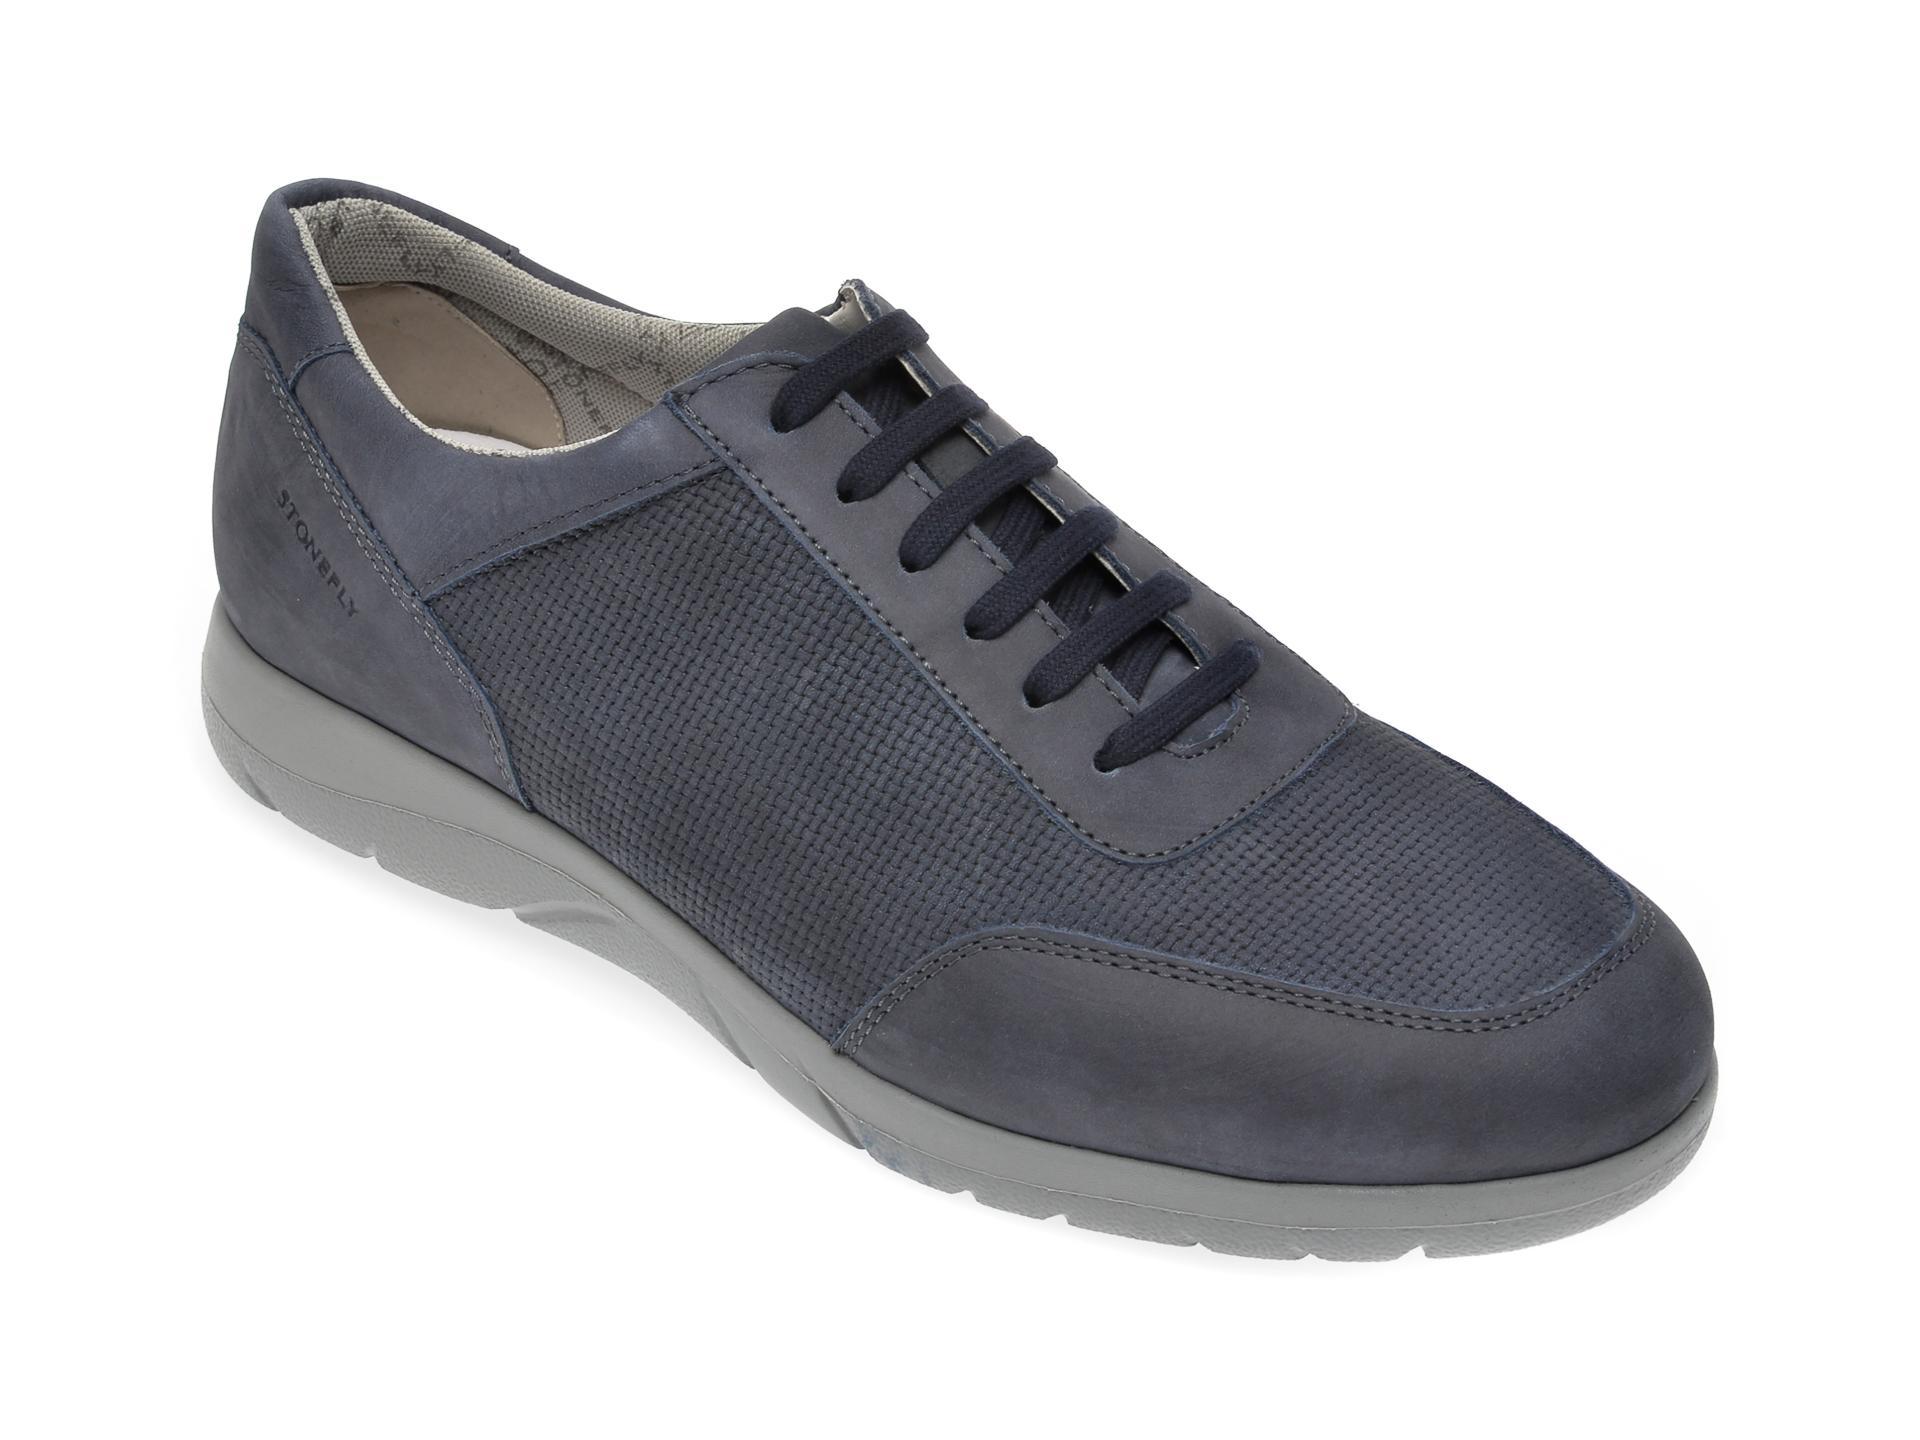 Pantofi STONEFLY bleumarin, SPAMA24, din nabuc imagine